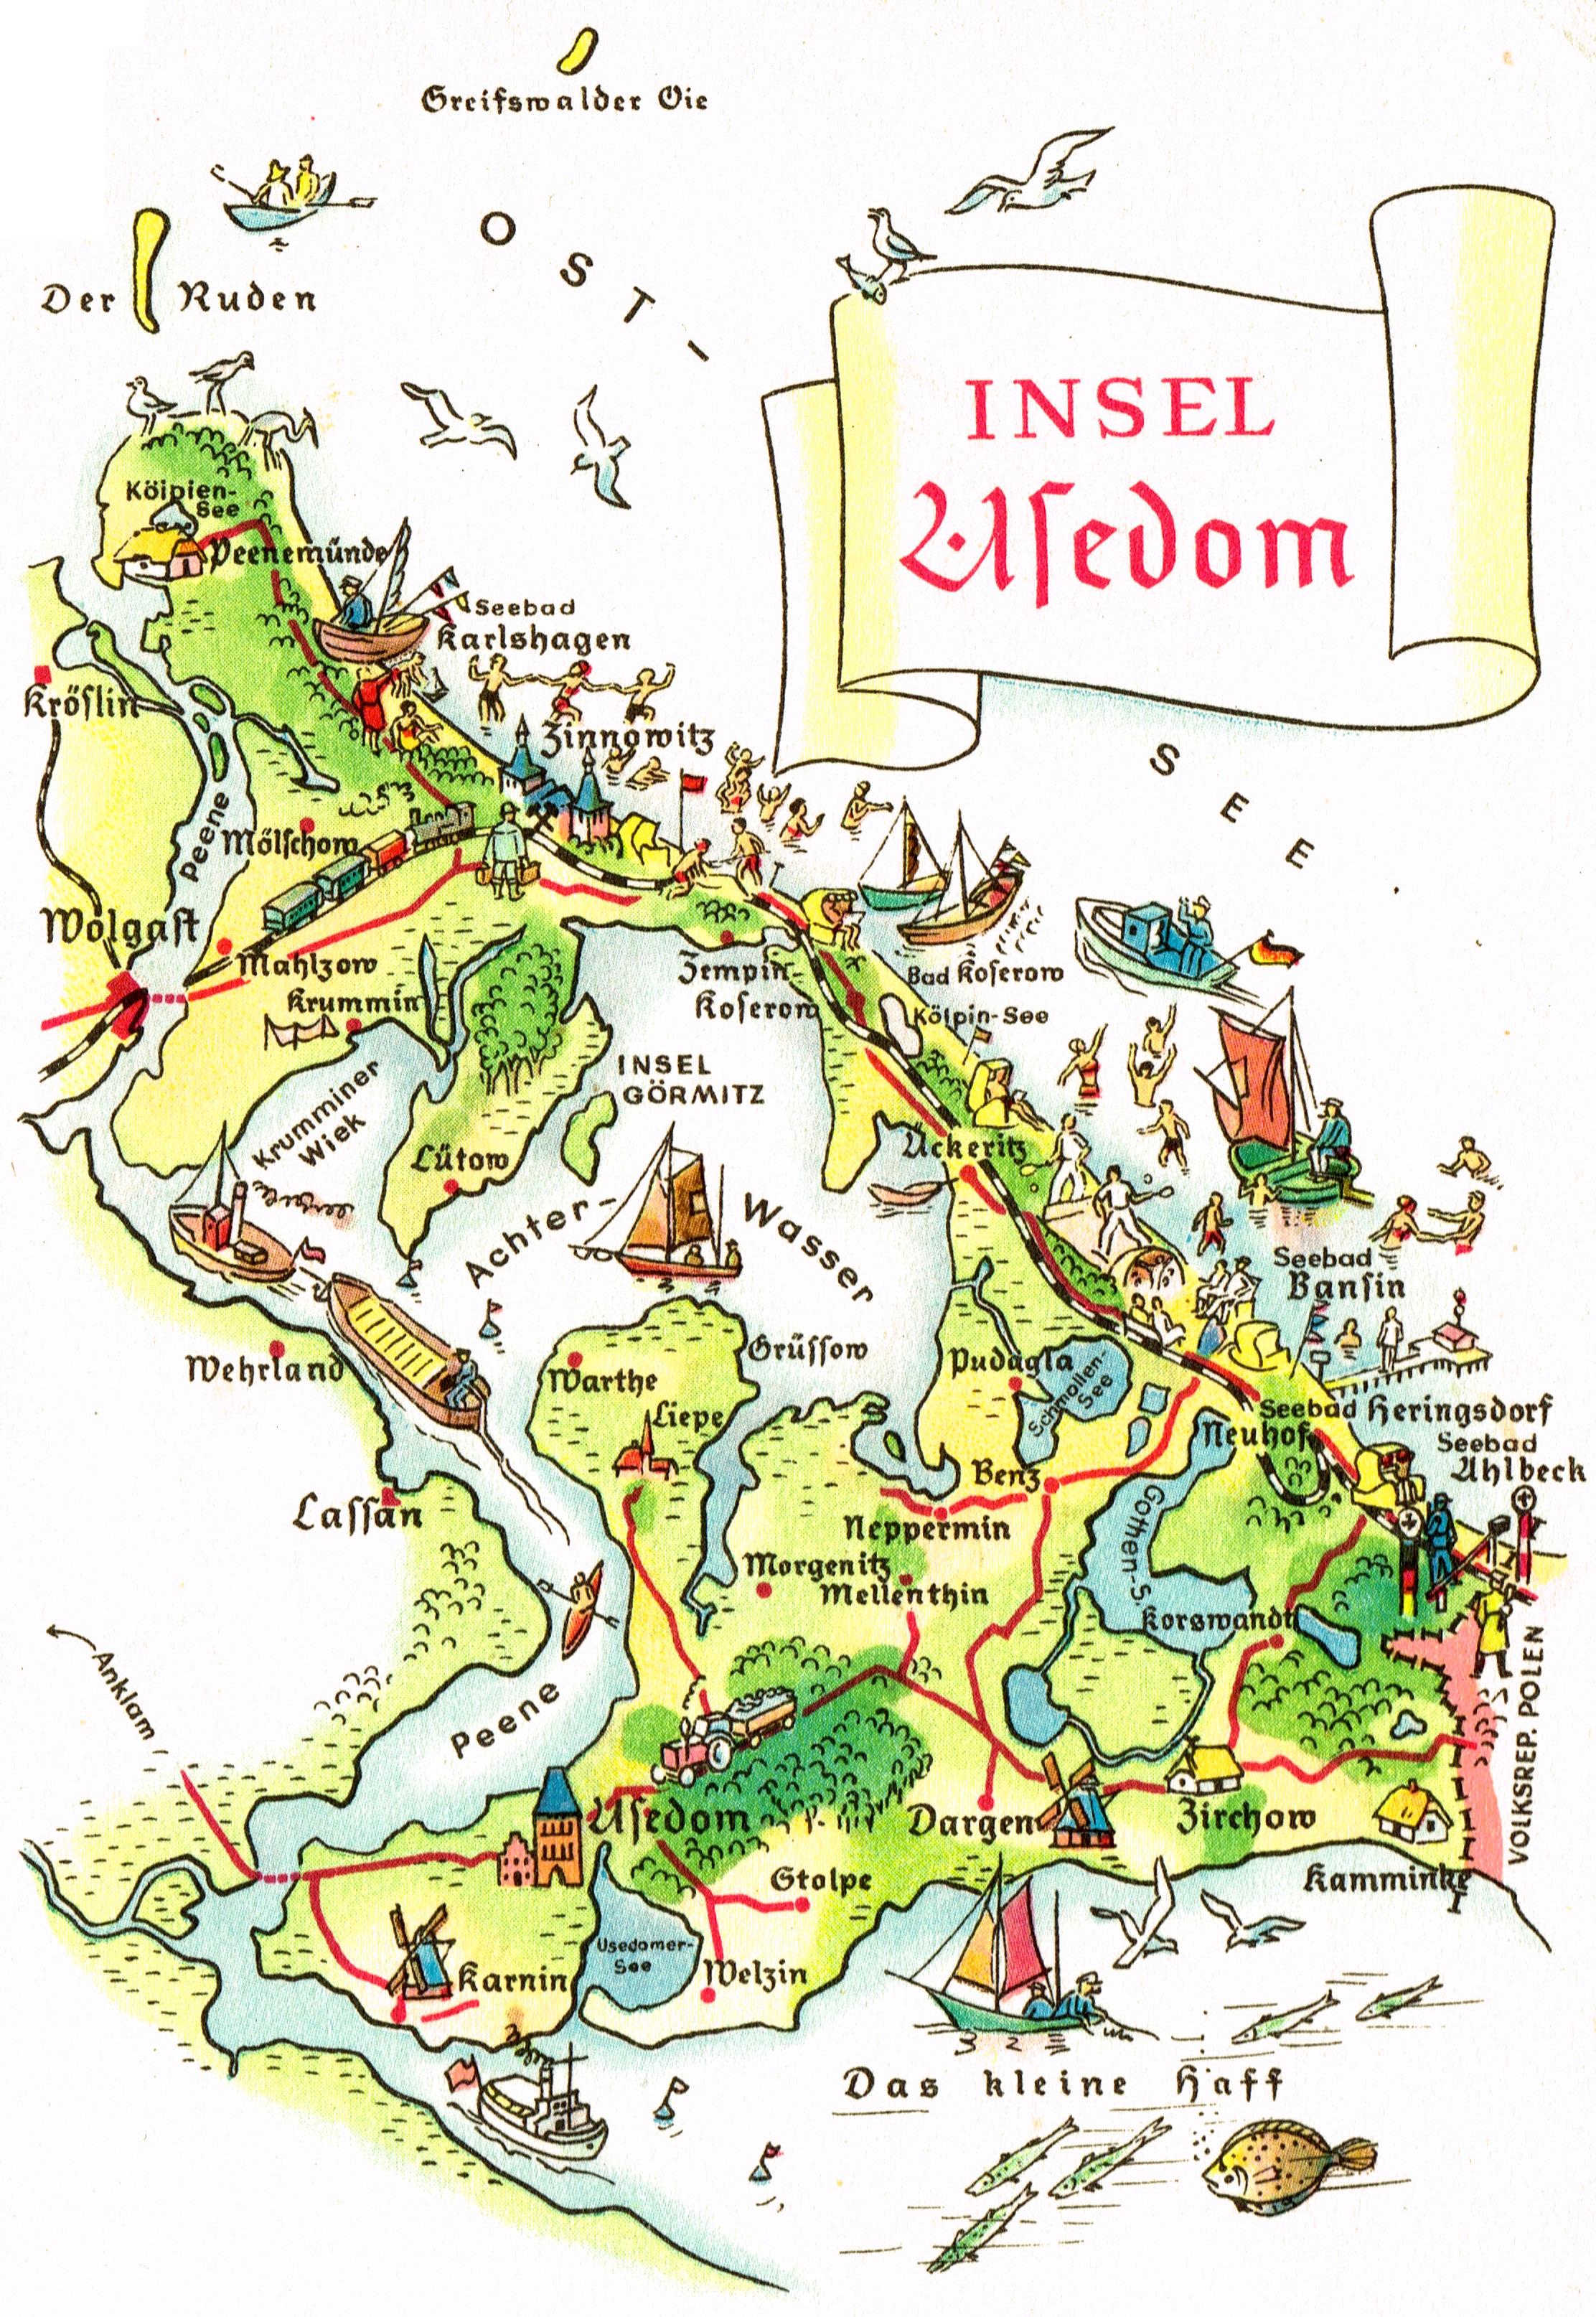 Insel Usedom Karte Ostsee.Karte Der Insel Usedom Creactie